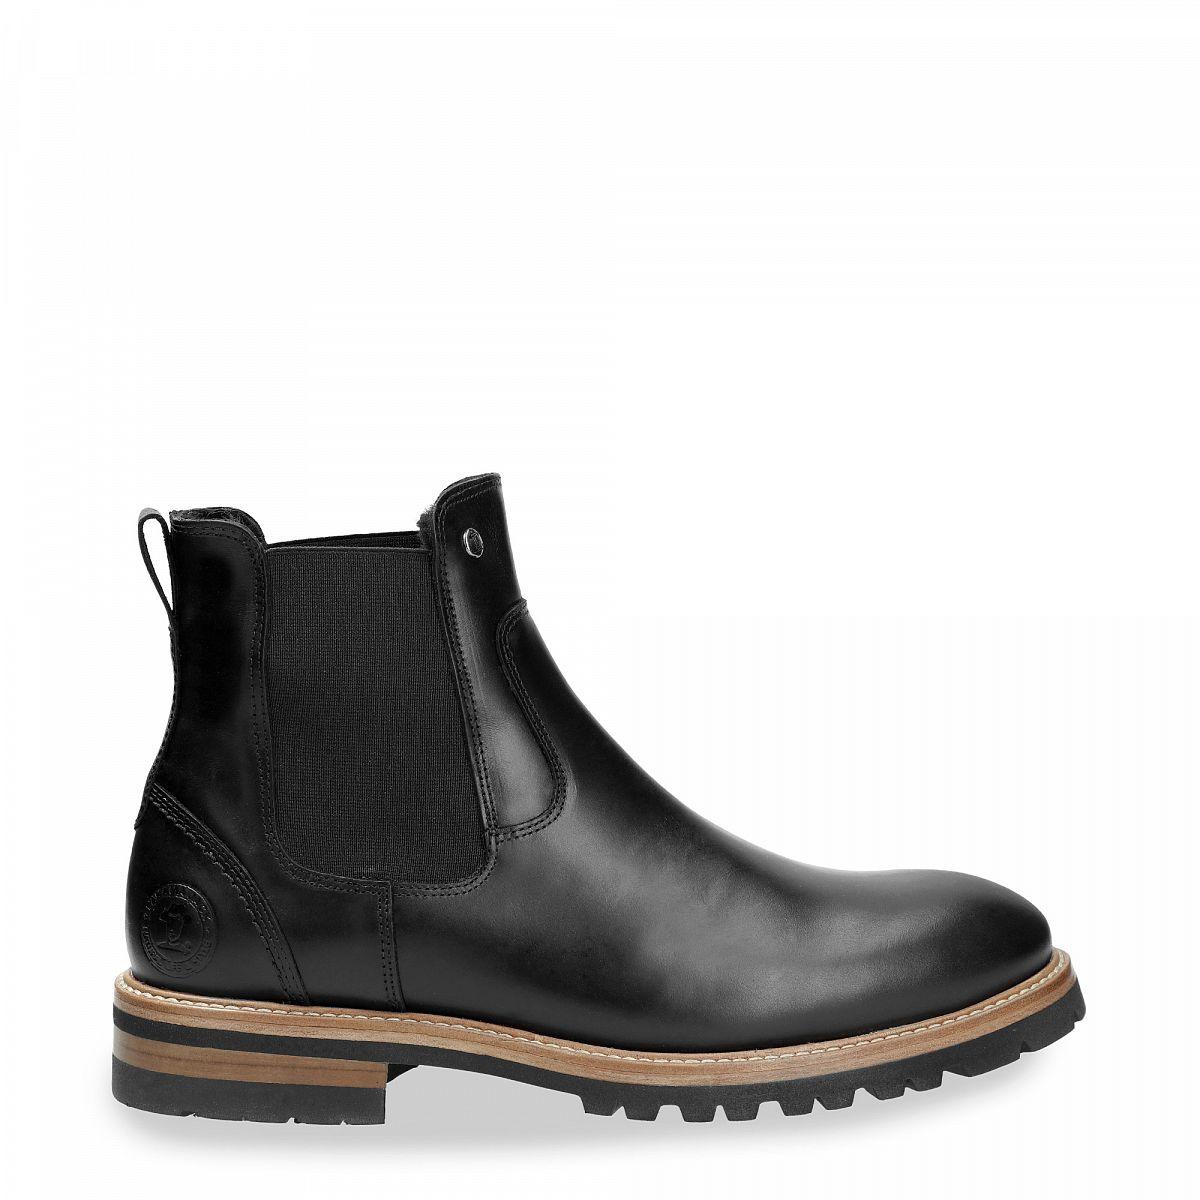 7904b6e74aa6 Men s ankle boot ENZO IGLOO black   PANAMA JACK® Official store